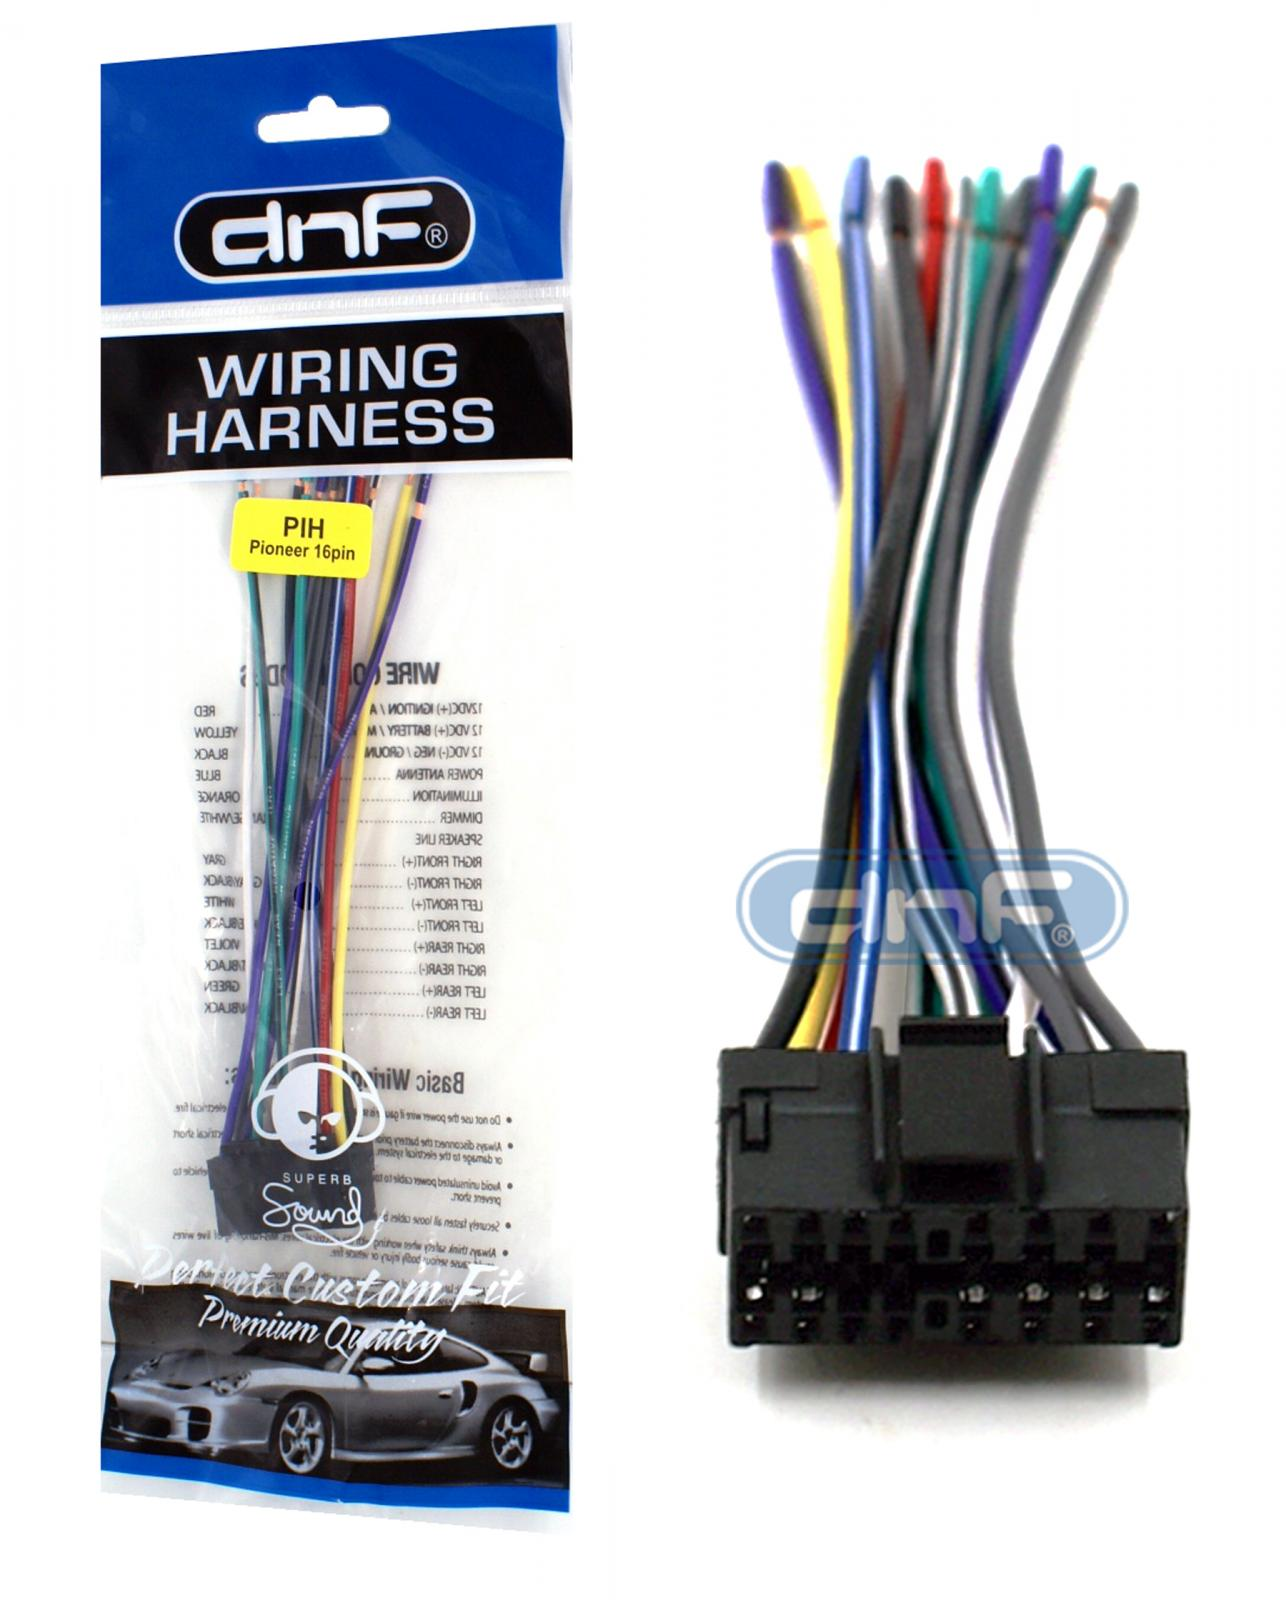 pioneer deh 1100 wiring diagram ford sony radio for ge model jbp27c0k1cc